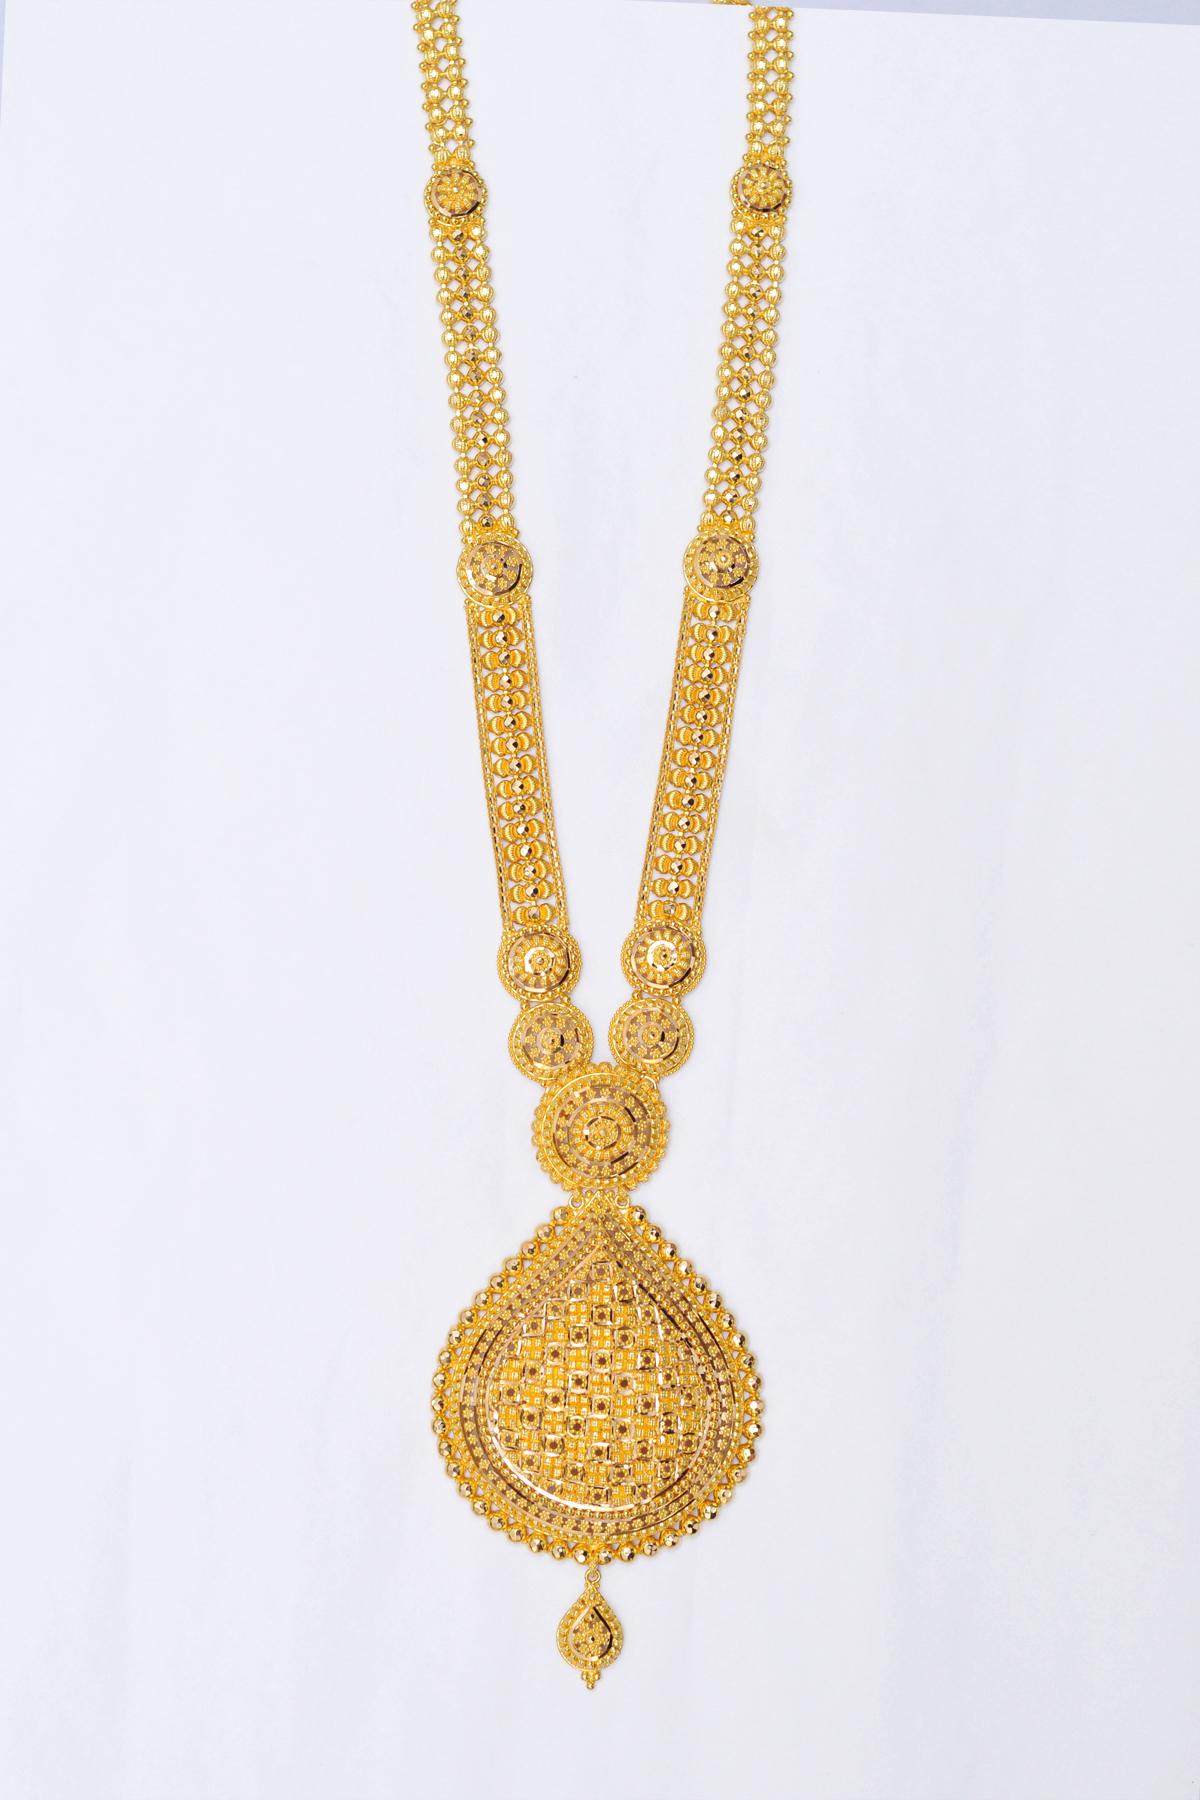 Latest Gold Long Necklace Designs | Gold Haram designs Uset Ranihaar mala set| wedding Necklace, gold jewelry manufacturer exporter kolkata